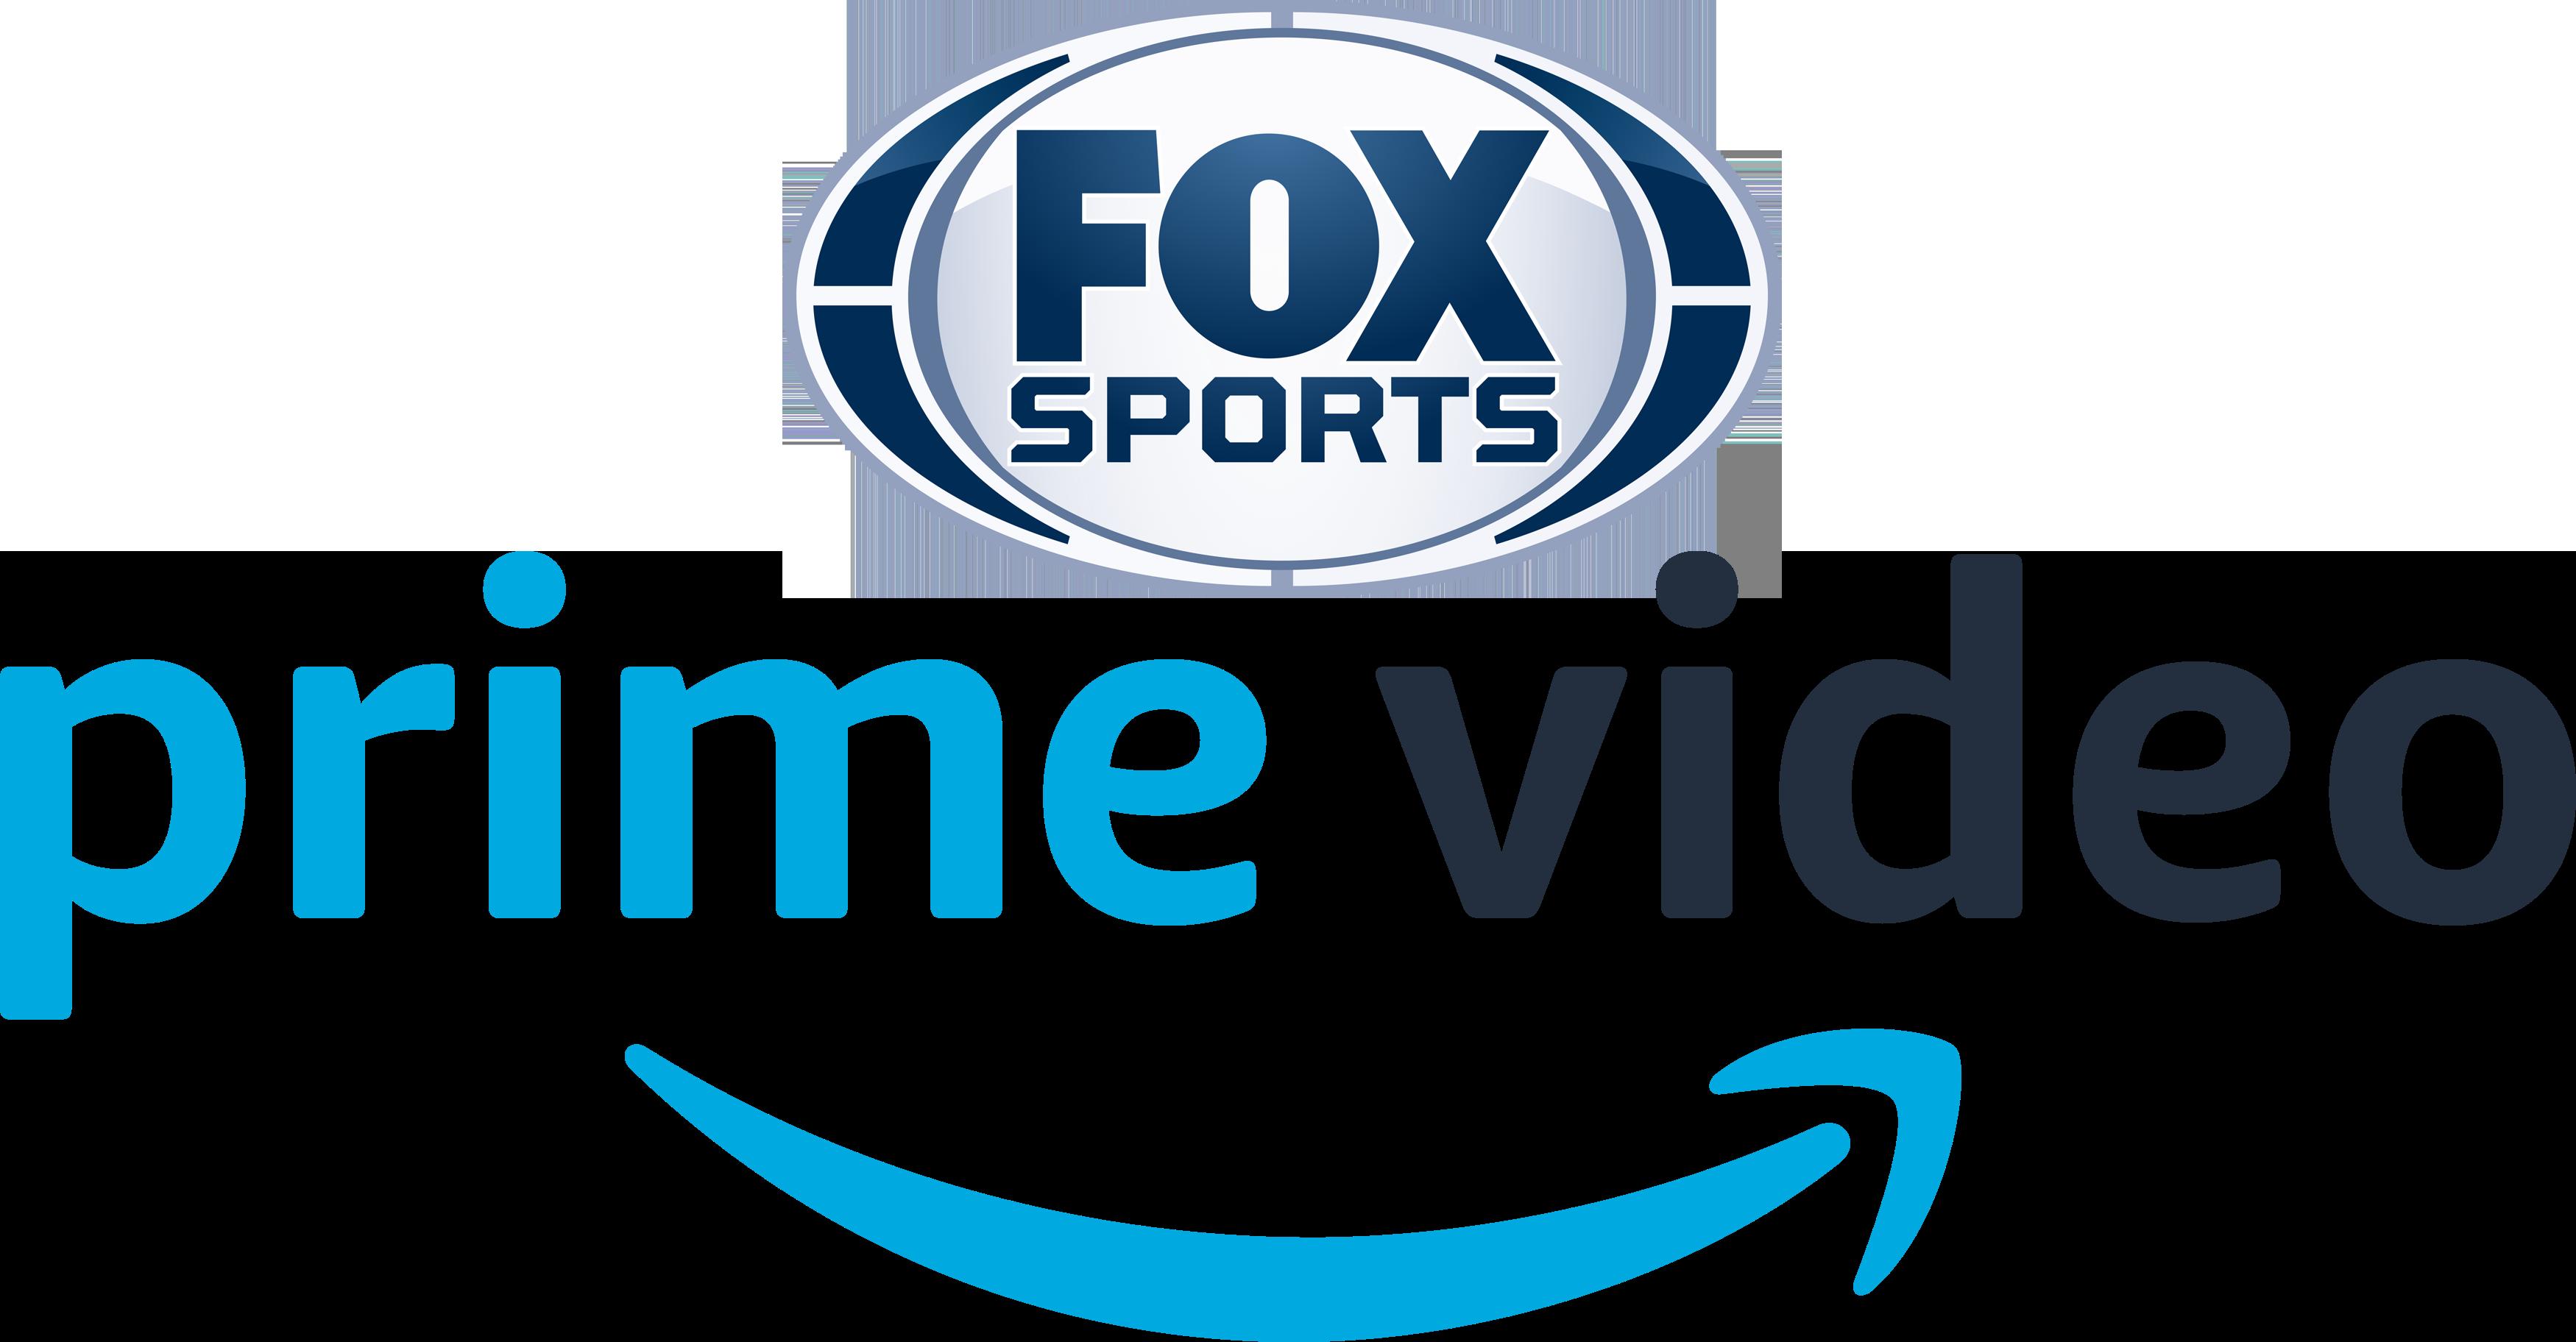 Fox Sports   Prime Video